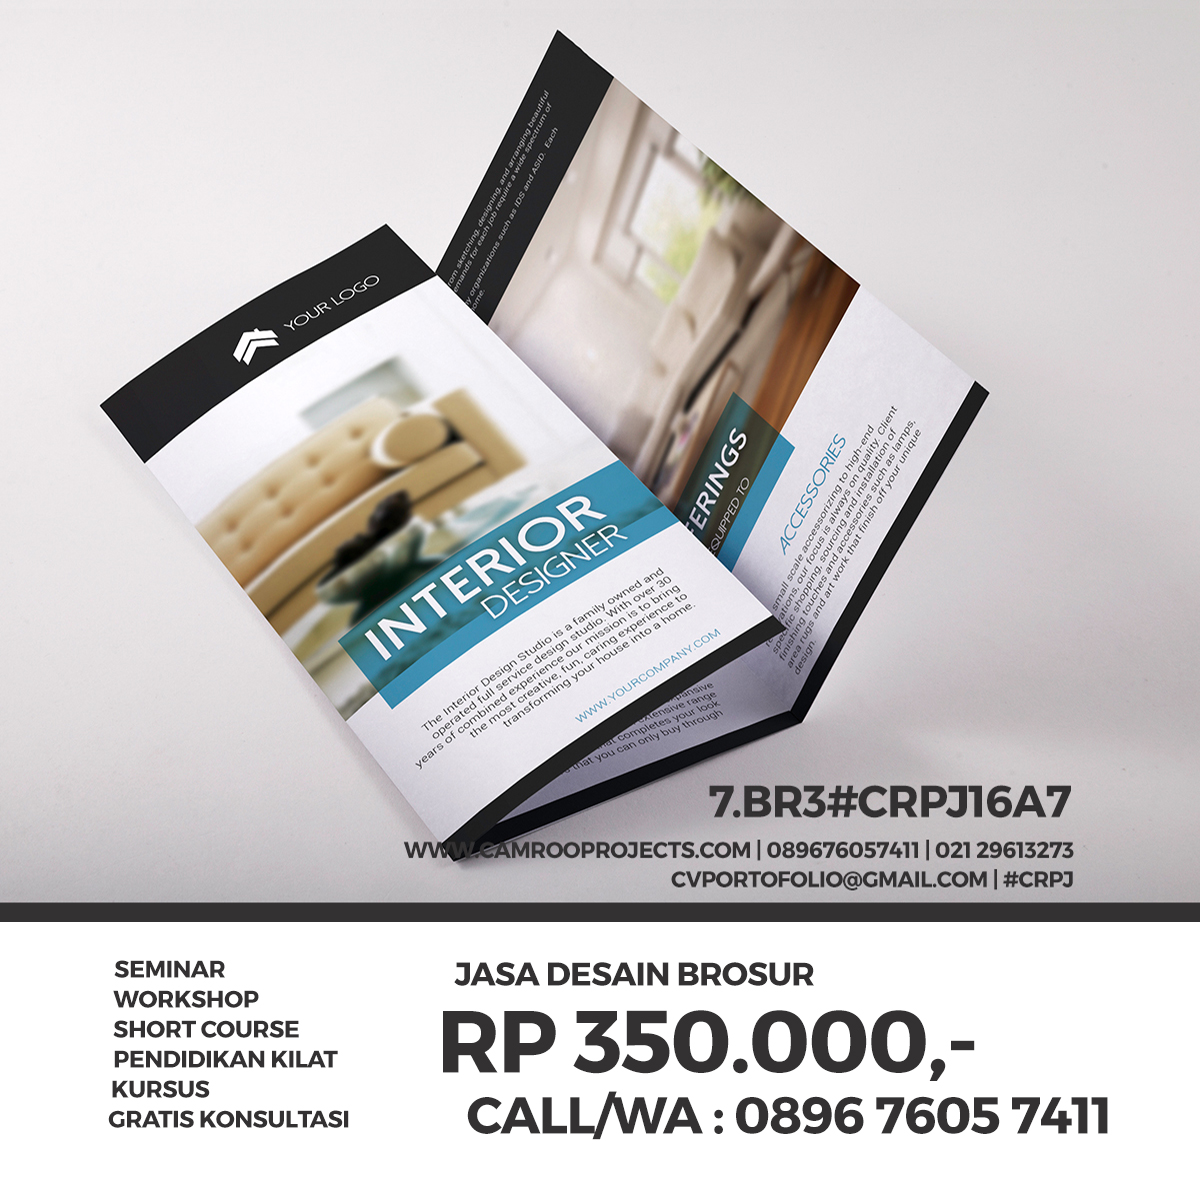 Jasa Desain Flyer | Call/WA 0896 760 574 11